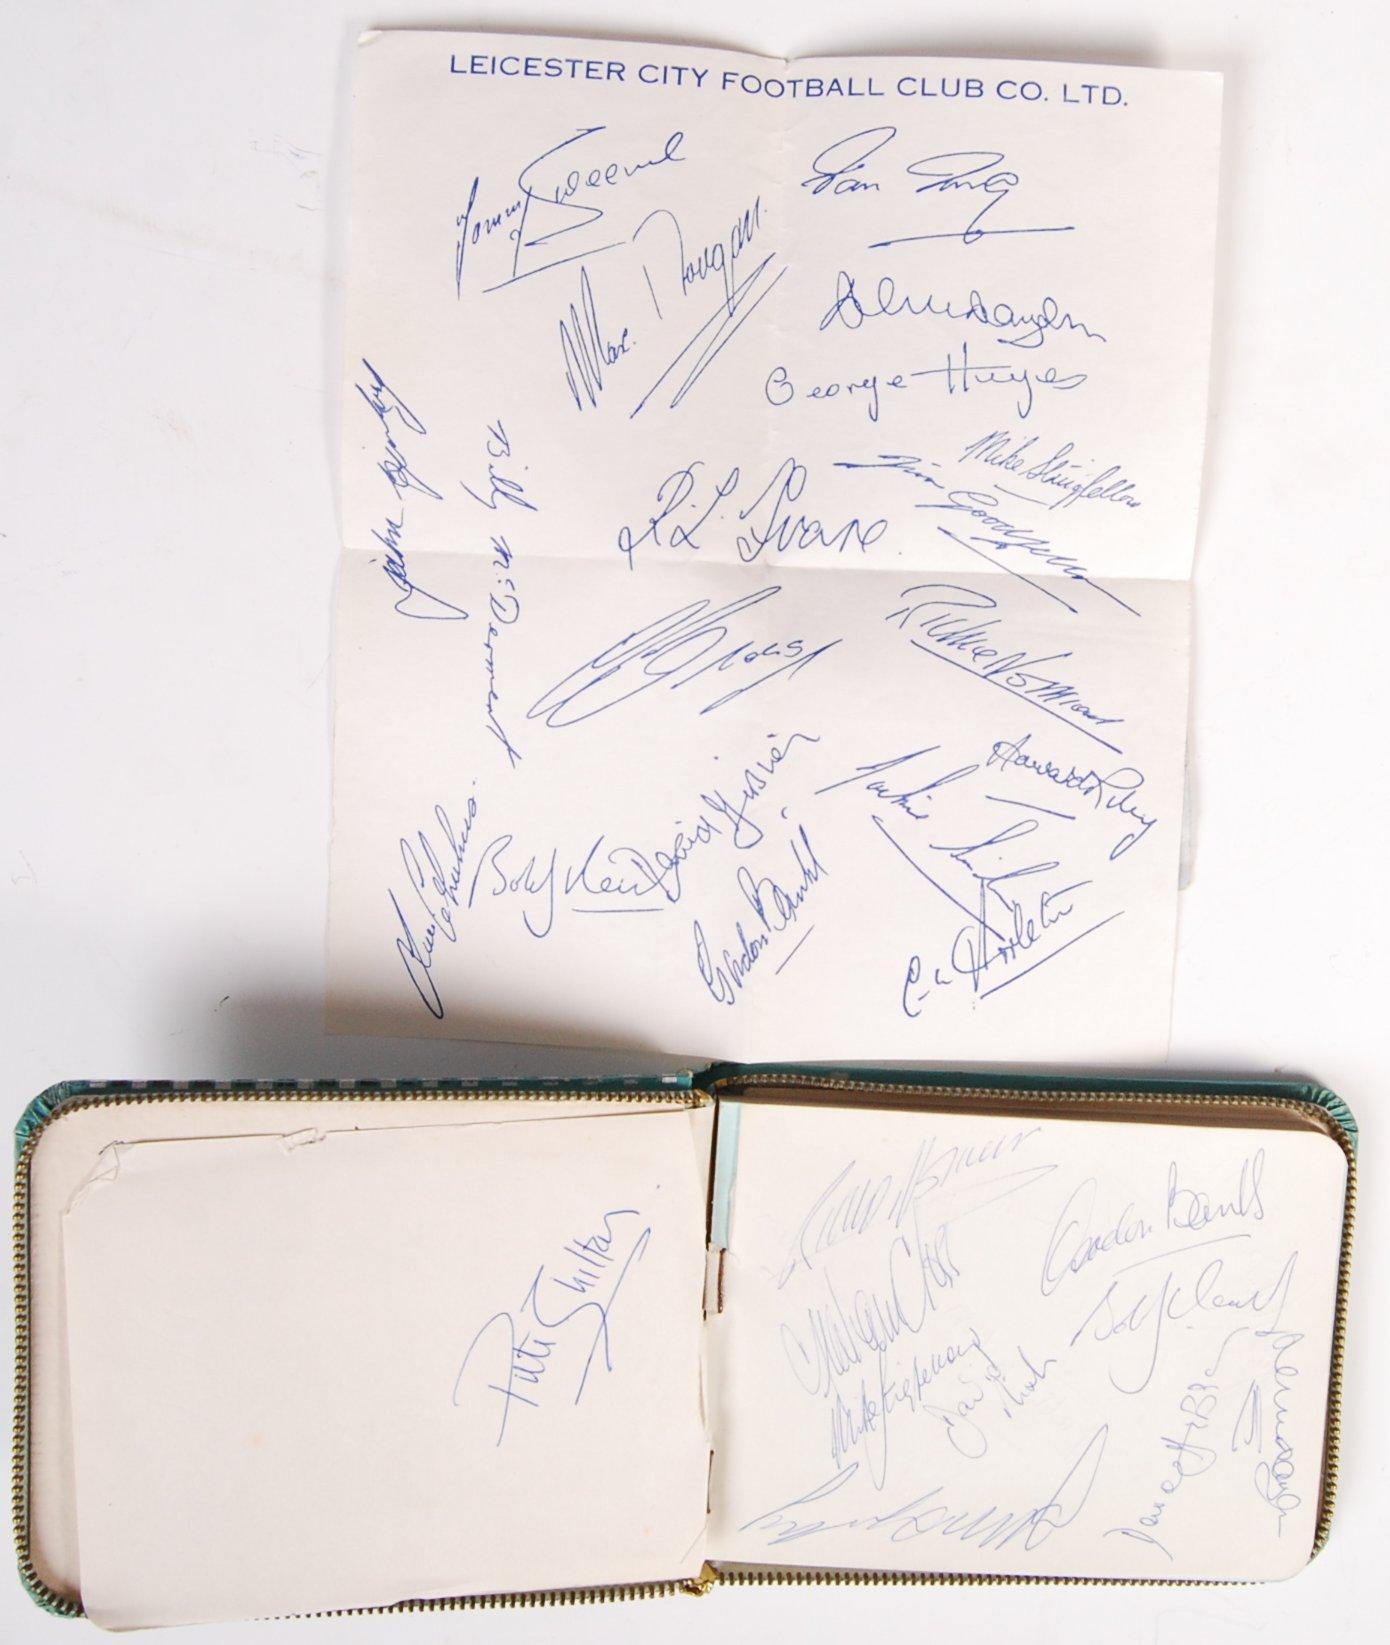 Lot 69 - 1960'S AUTOGRAPH BOOK - LEICESTER CITY & FOOTBALLE